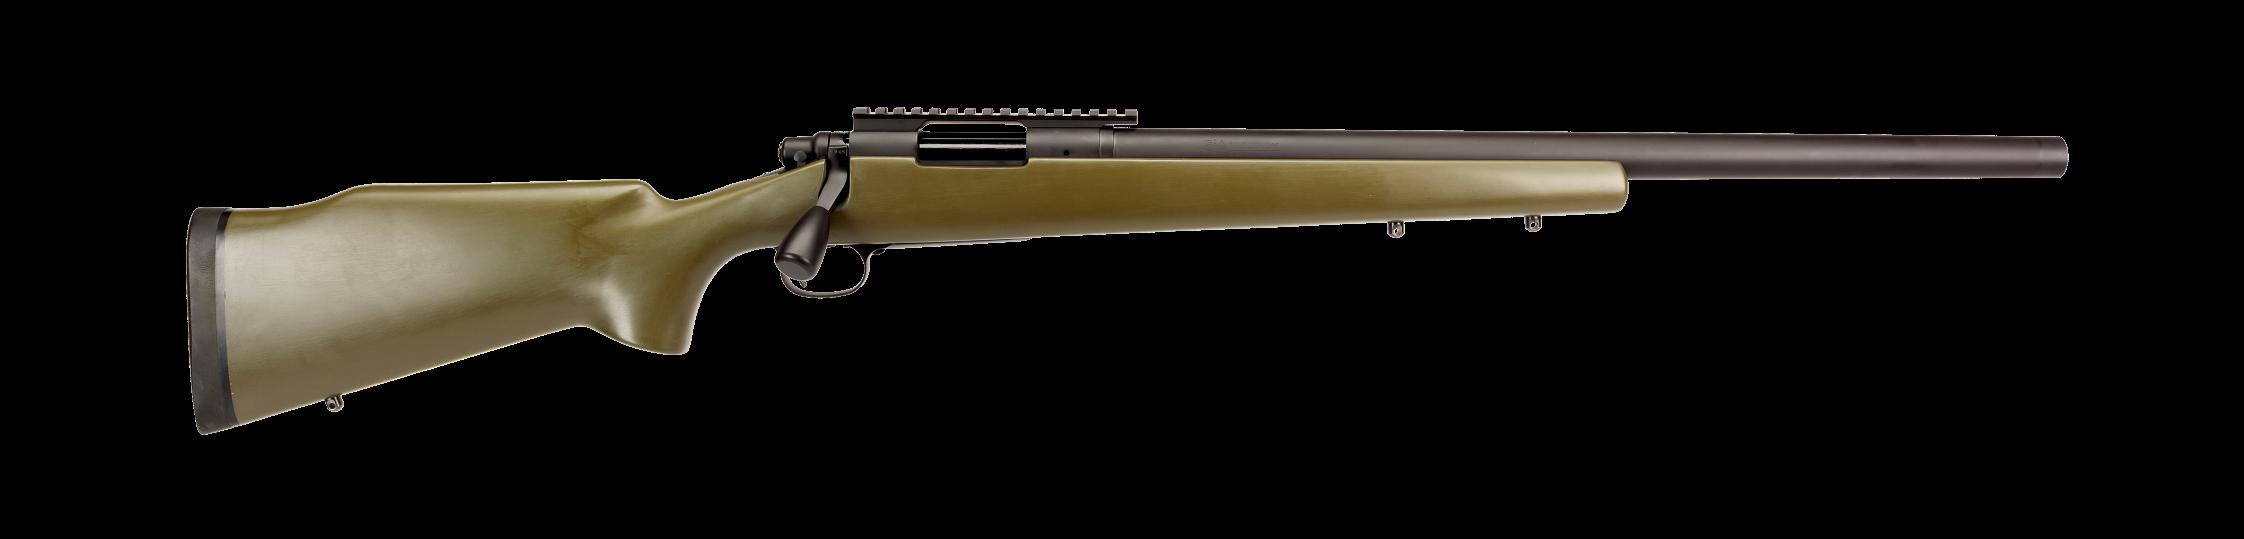 Shot clipart rifle shooting. Custom rifles base